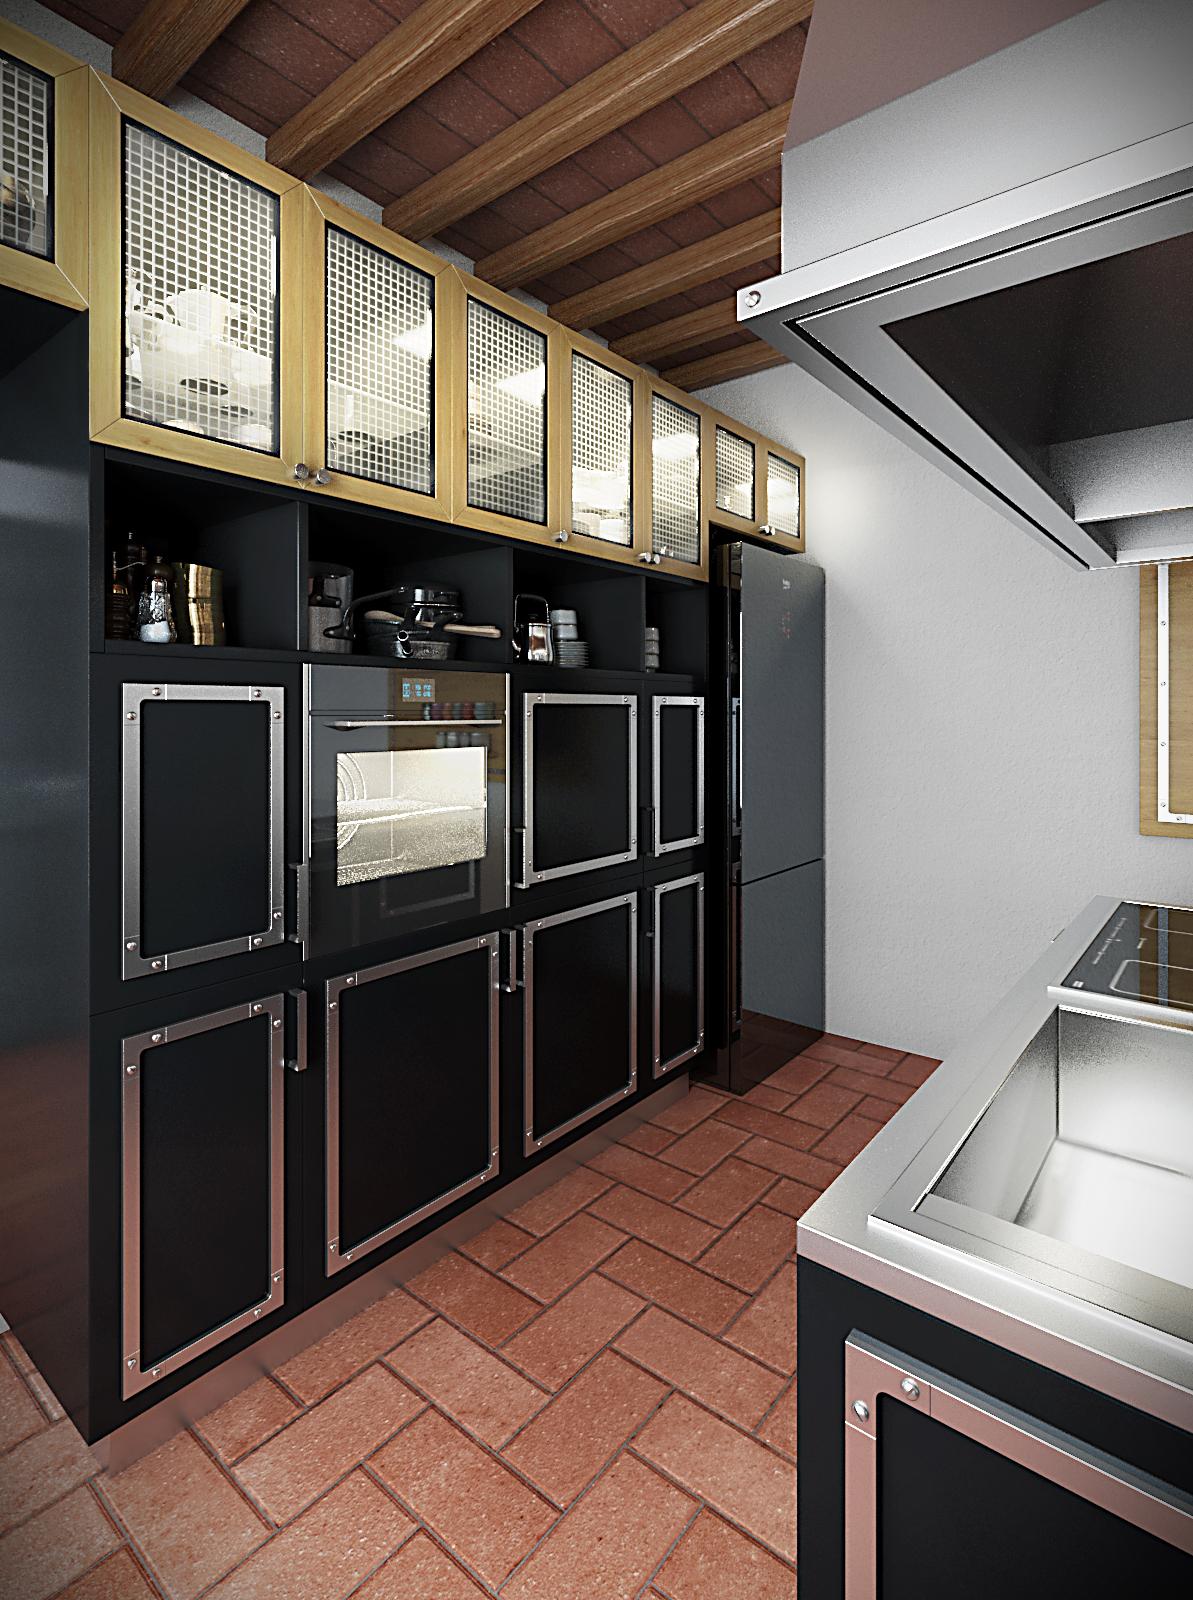 STUDIO ARCHITETTURA FIRENZE – Cucina per casa colonica